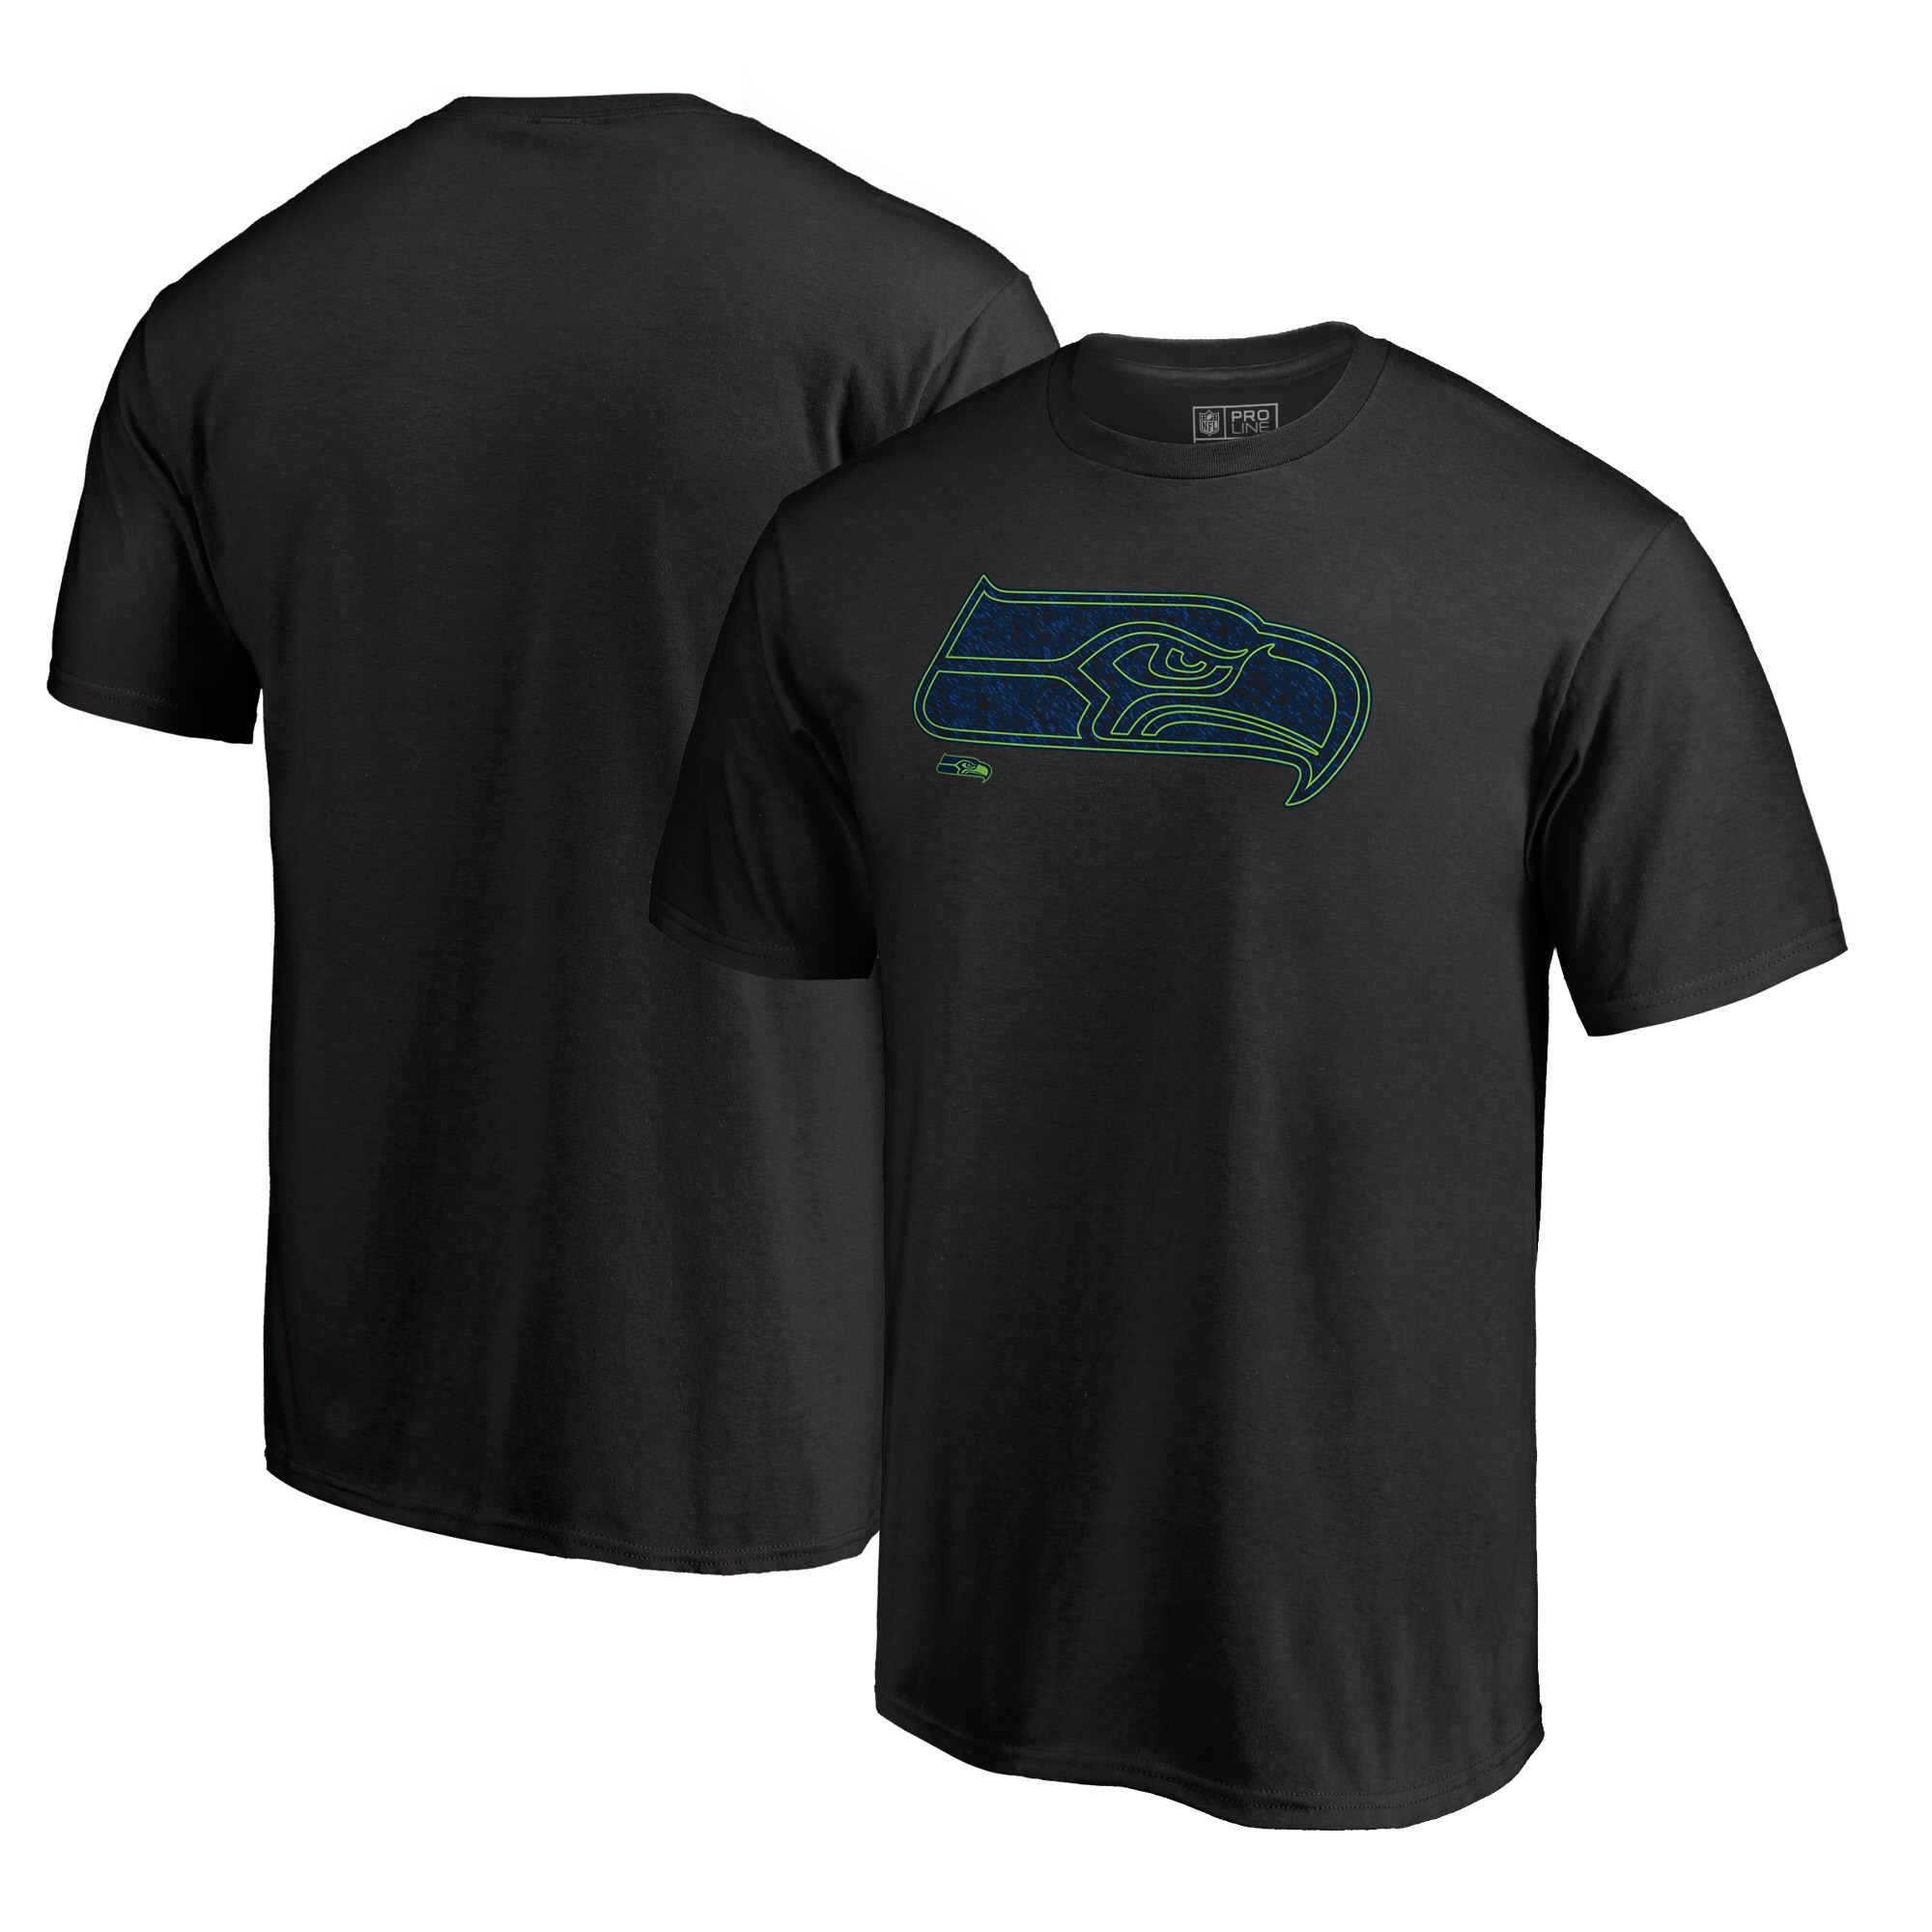 Seattle Seahawks NFL Pro Line by Fanatics Branded Big & Tall Training Camp Hookup T-Shirt - Black